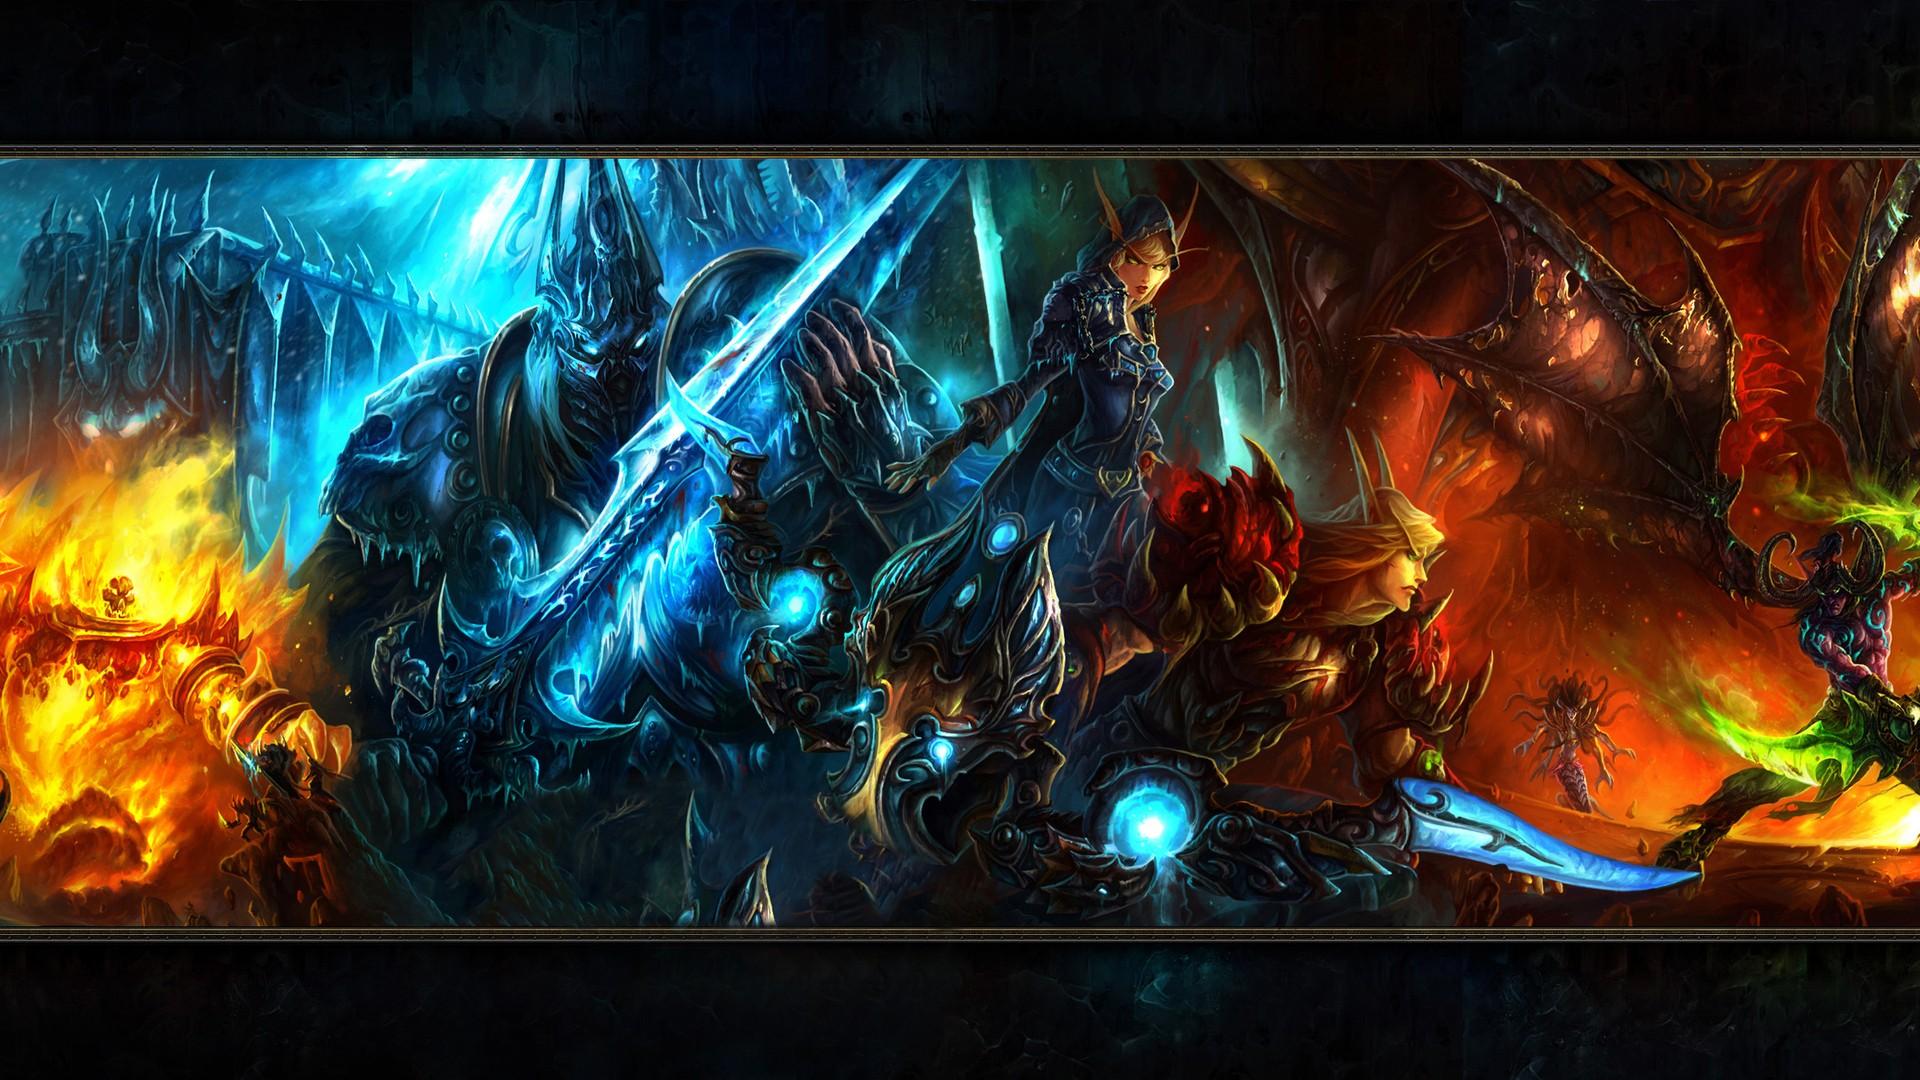 free download dual monitor wallpaper video game 3840x1080 windows 10 · 3840x1080 free download dual ...